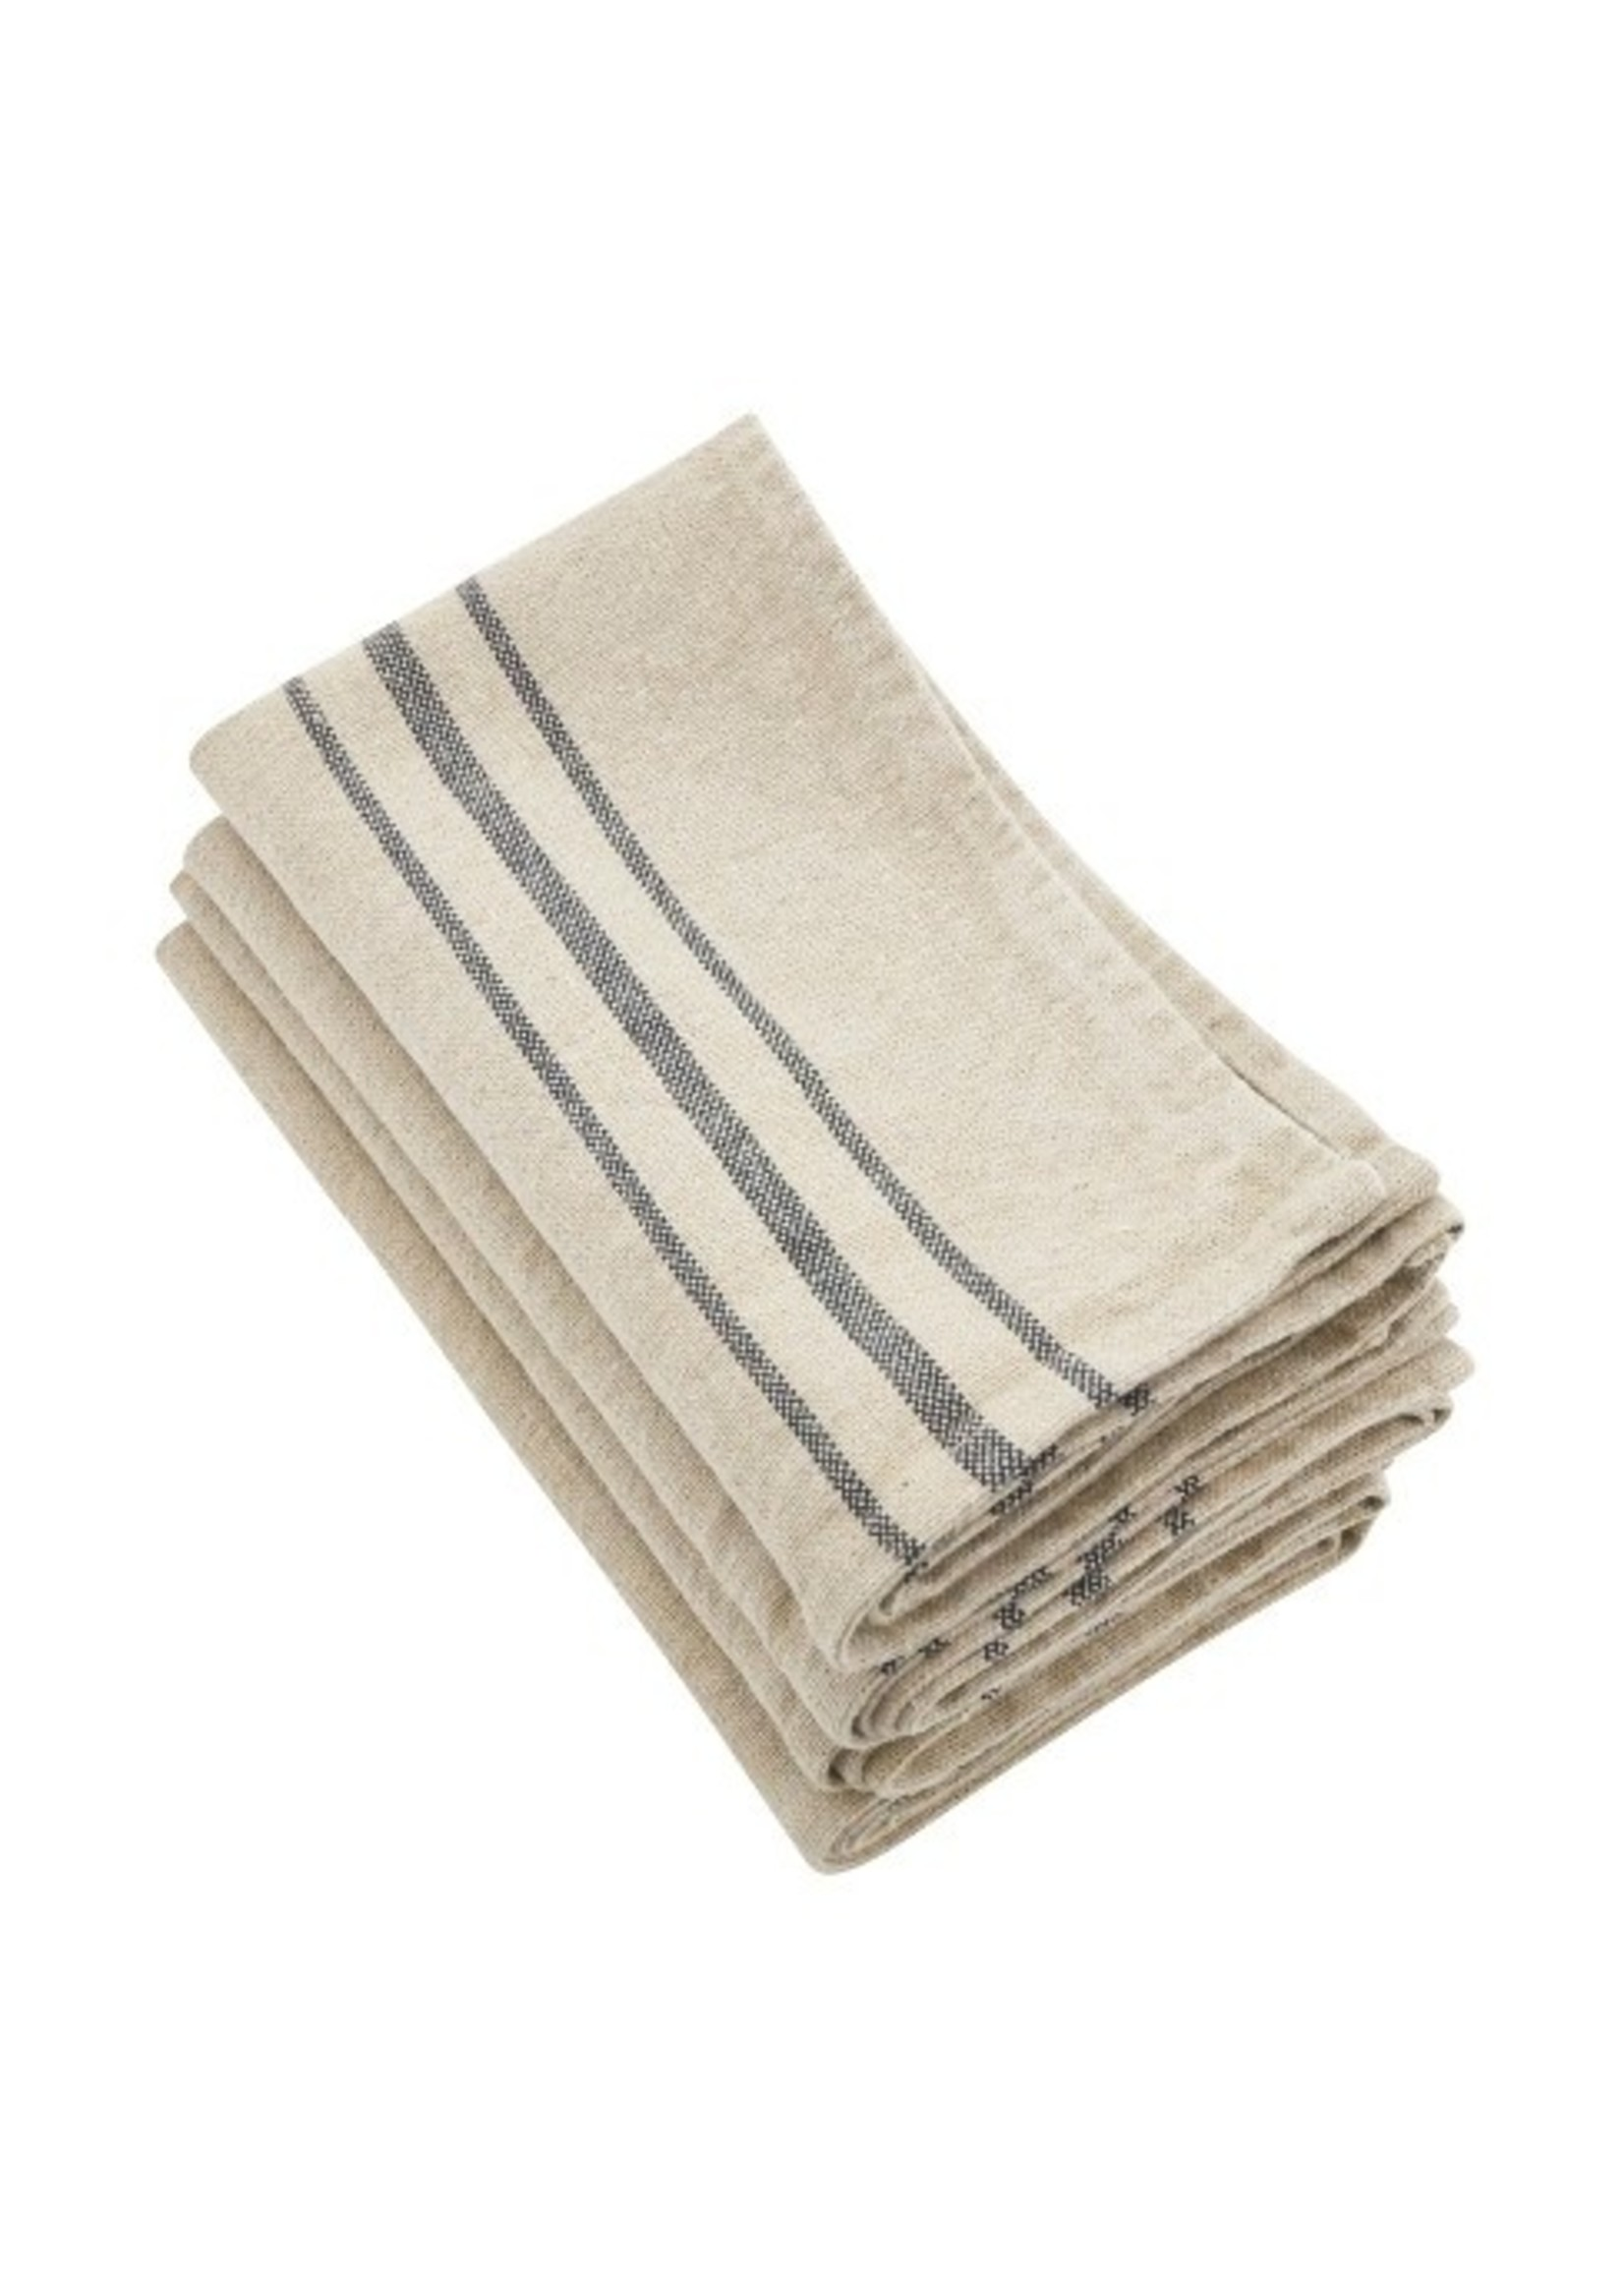 Saro Striped Linen Napkin Natural